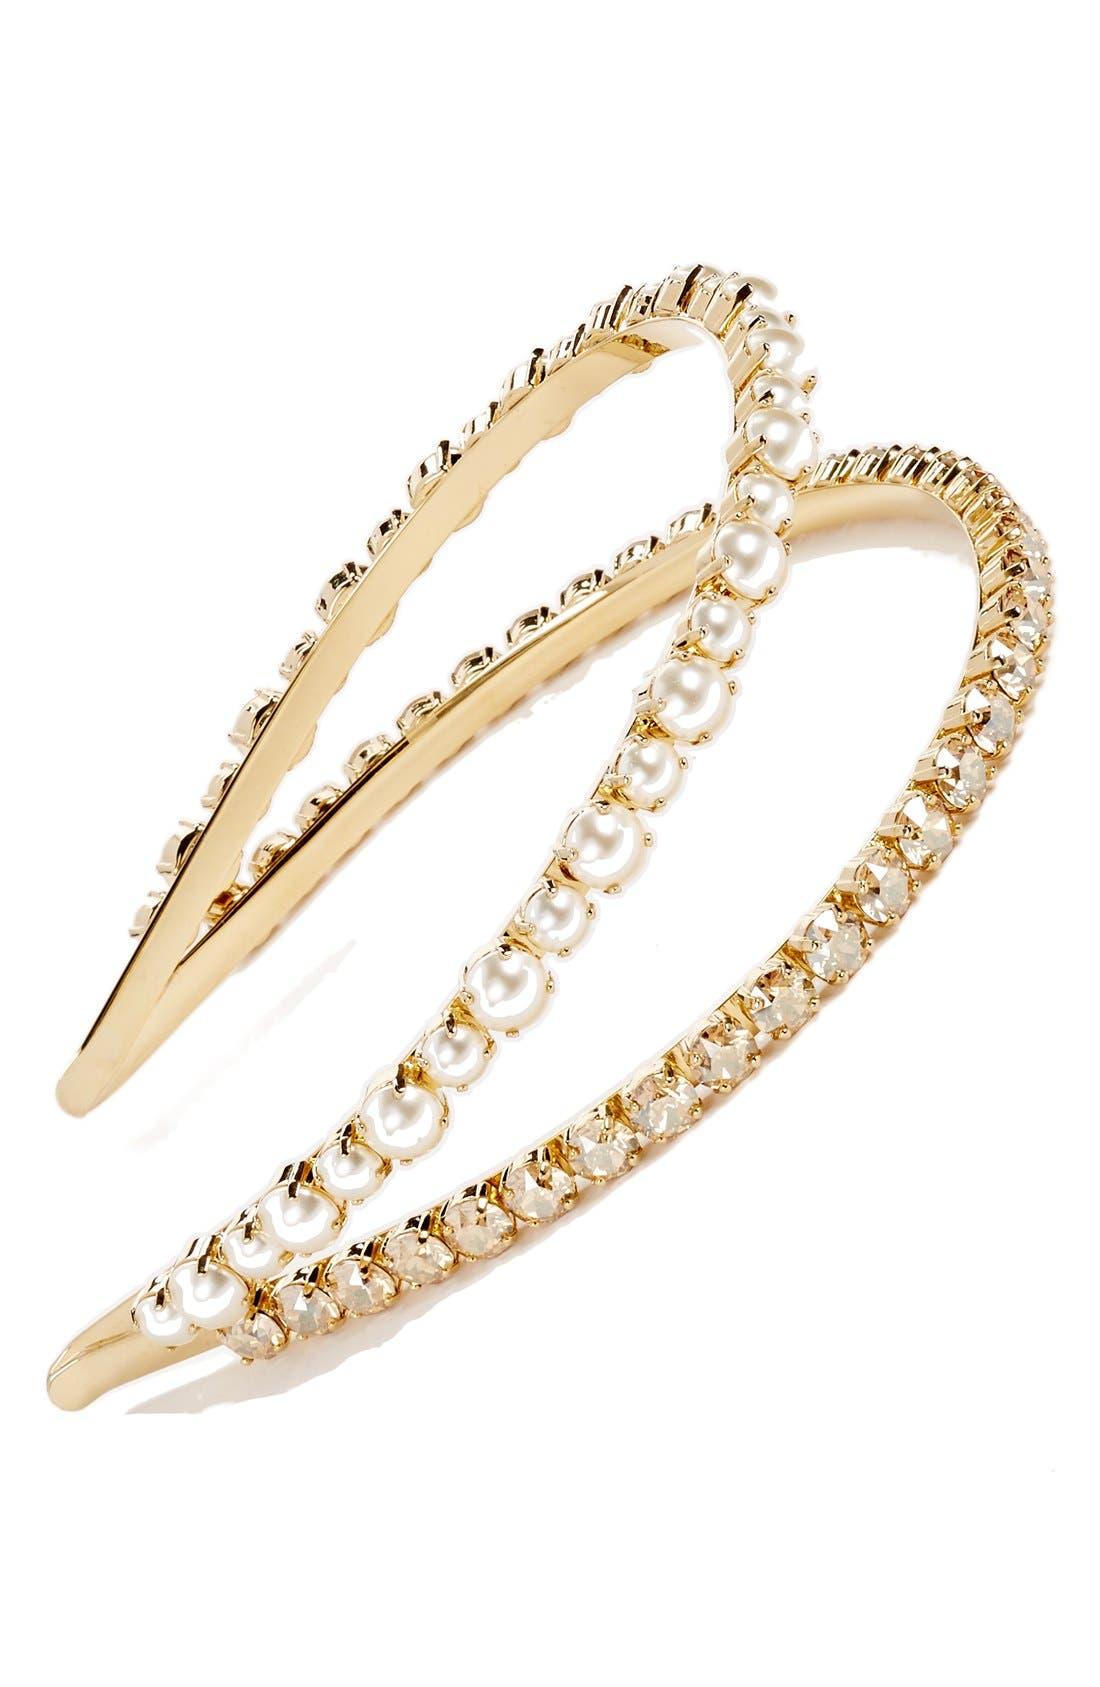 Alternate Image 1 Selected - Miu Miu 'Classic' Bead & Crystal Double Headband